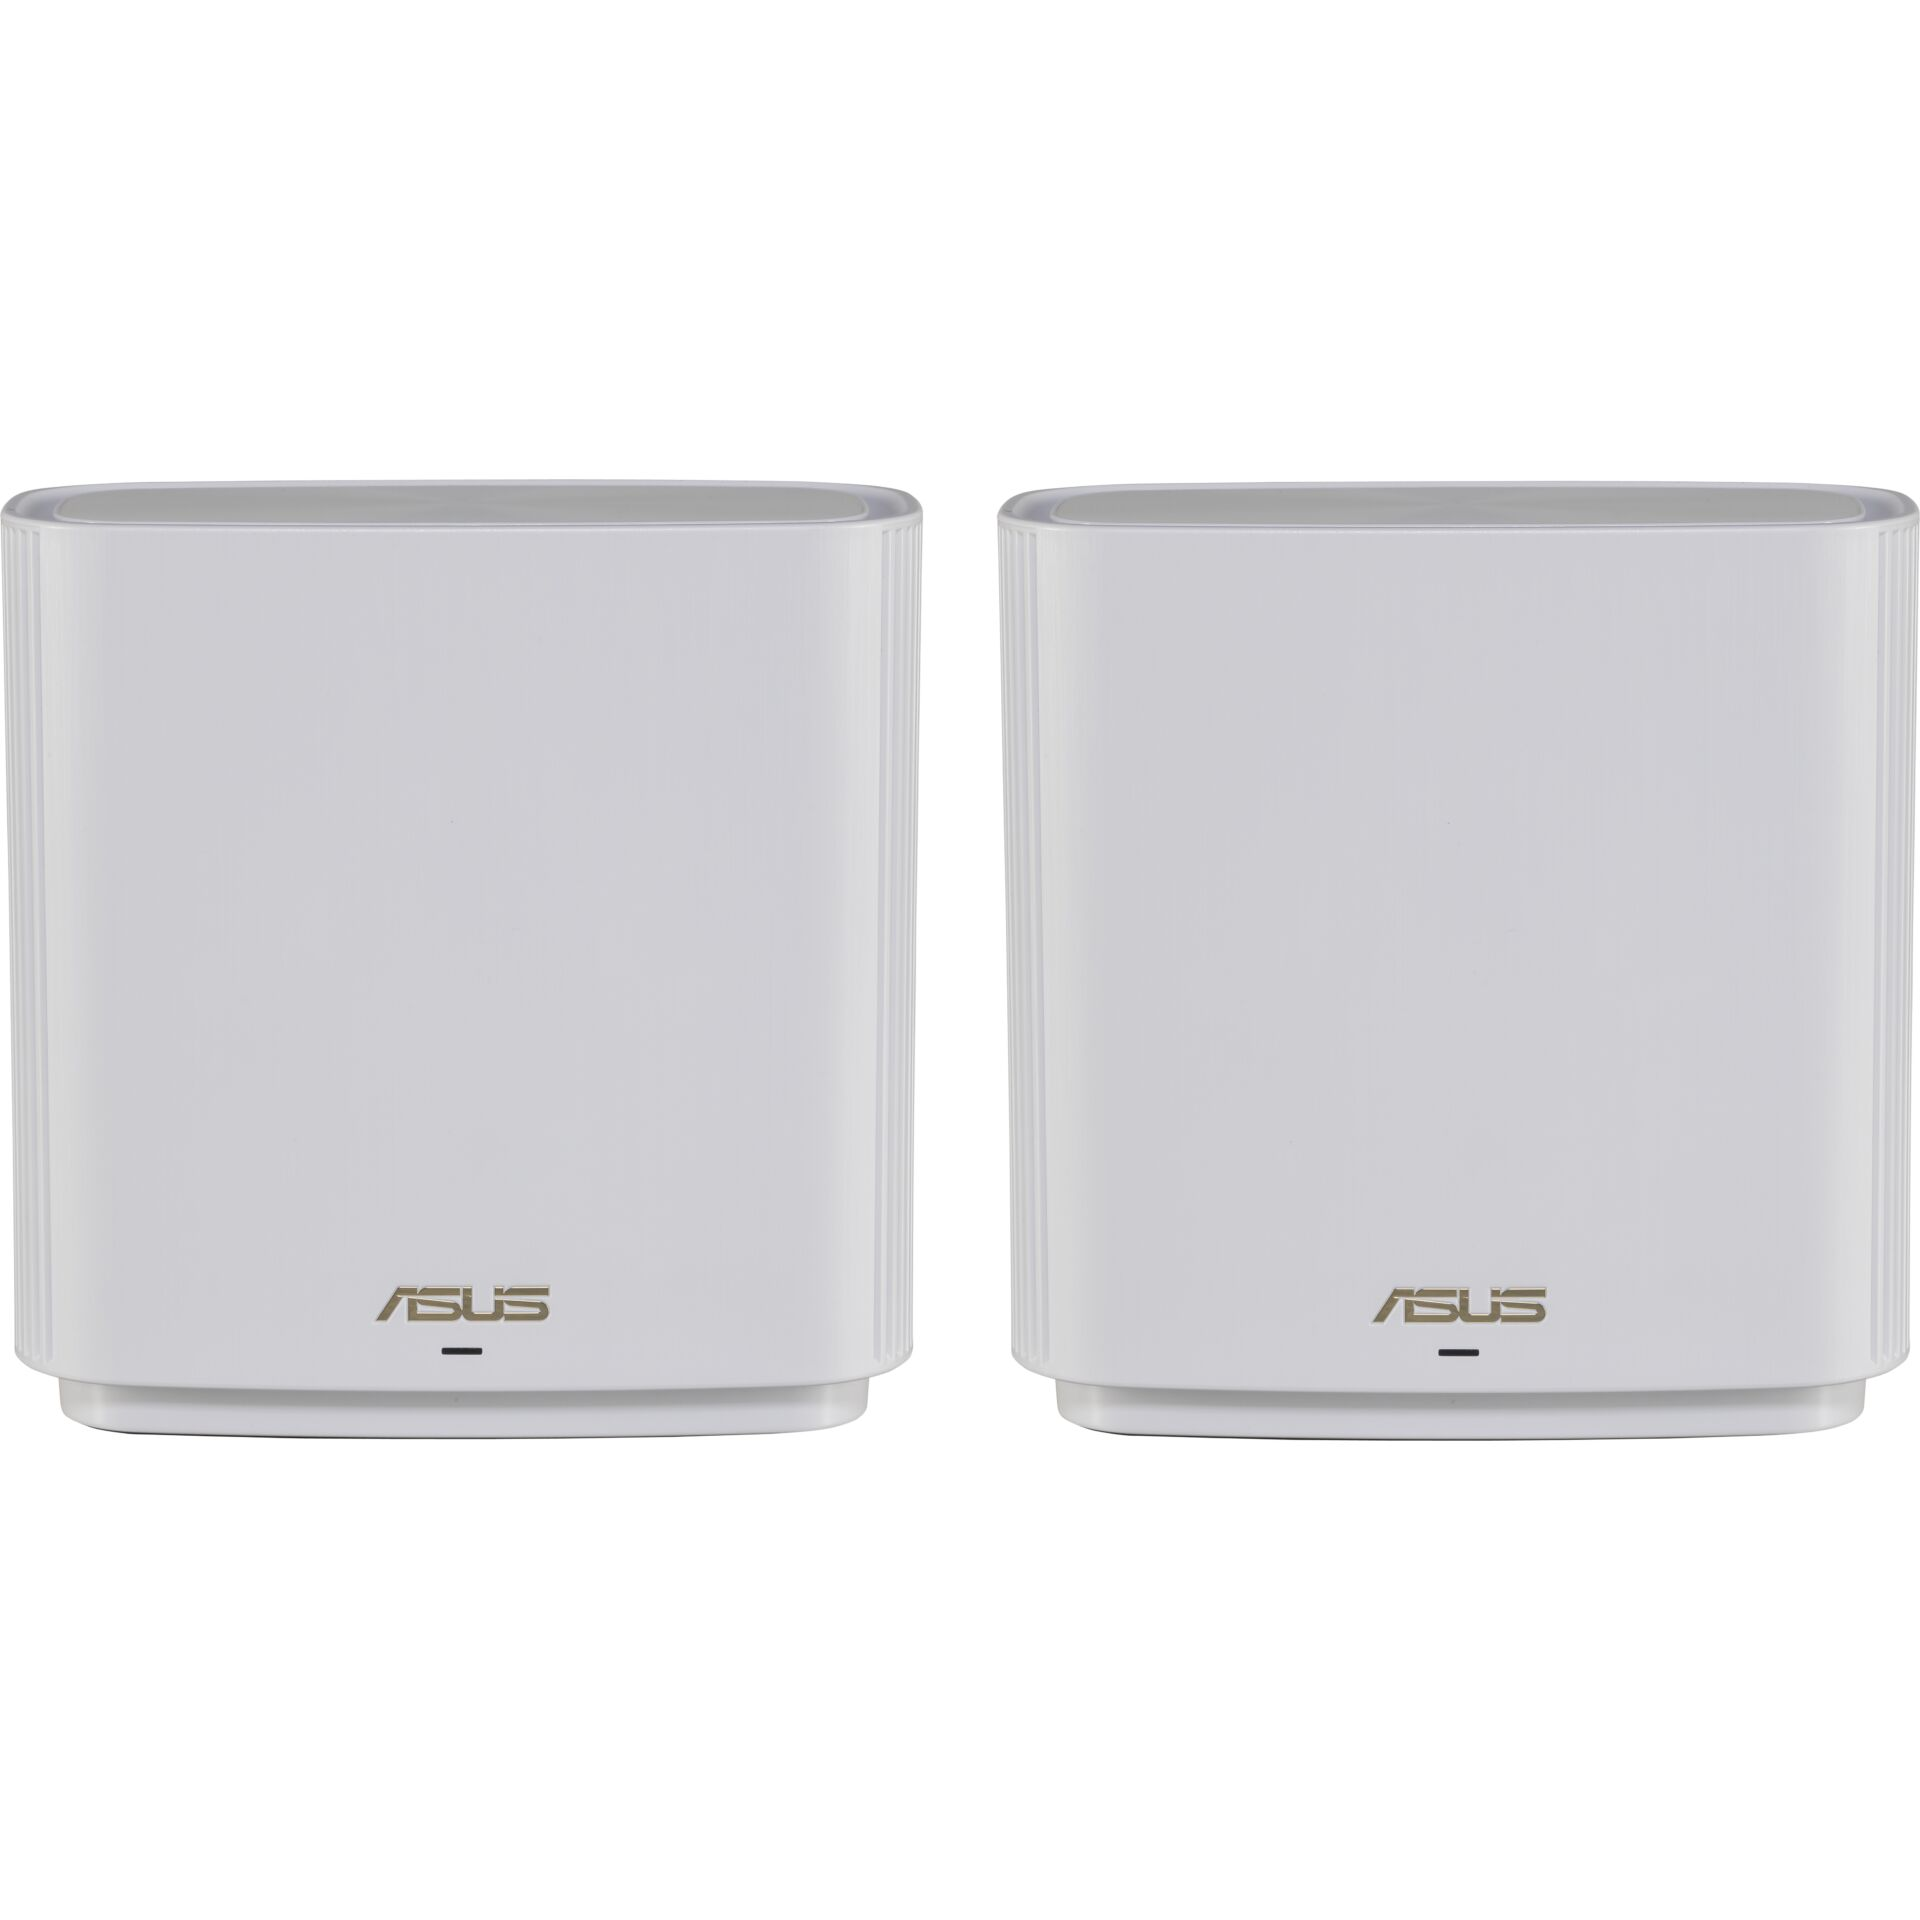 Asus ZenWiFi AX AX6600 2 Pack White